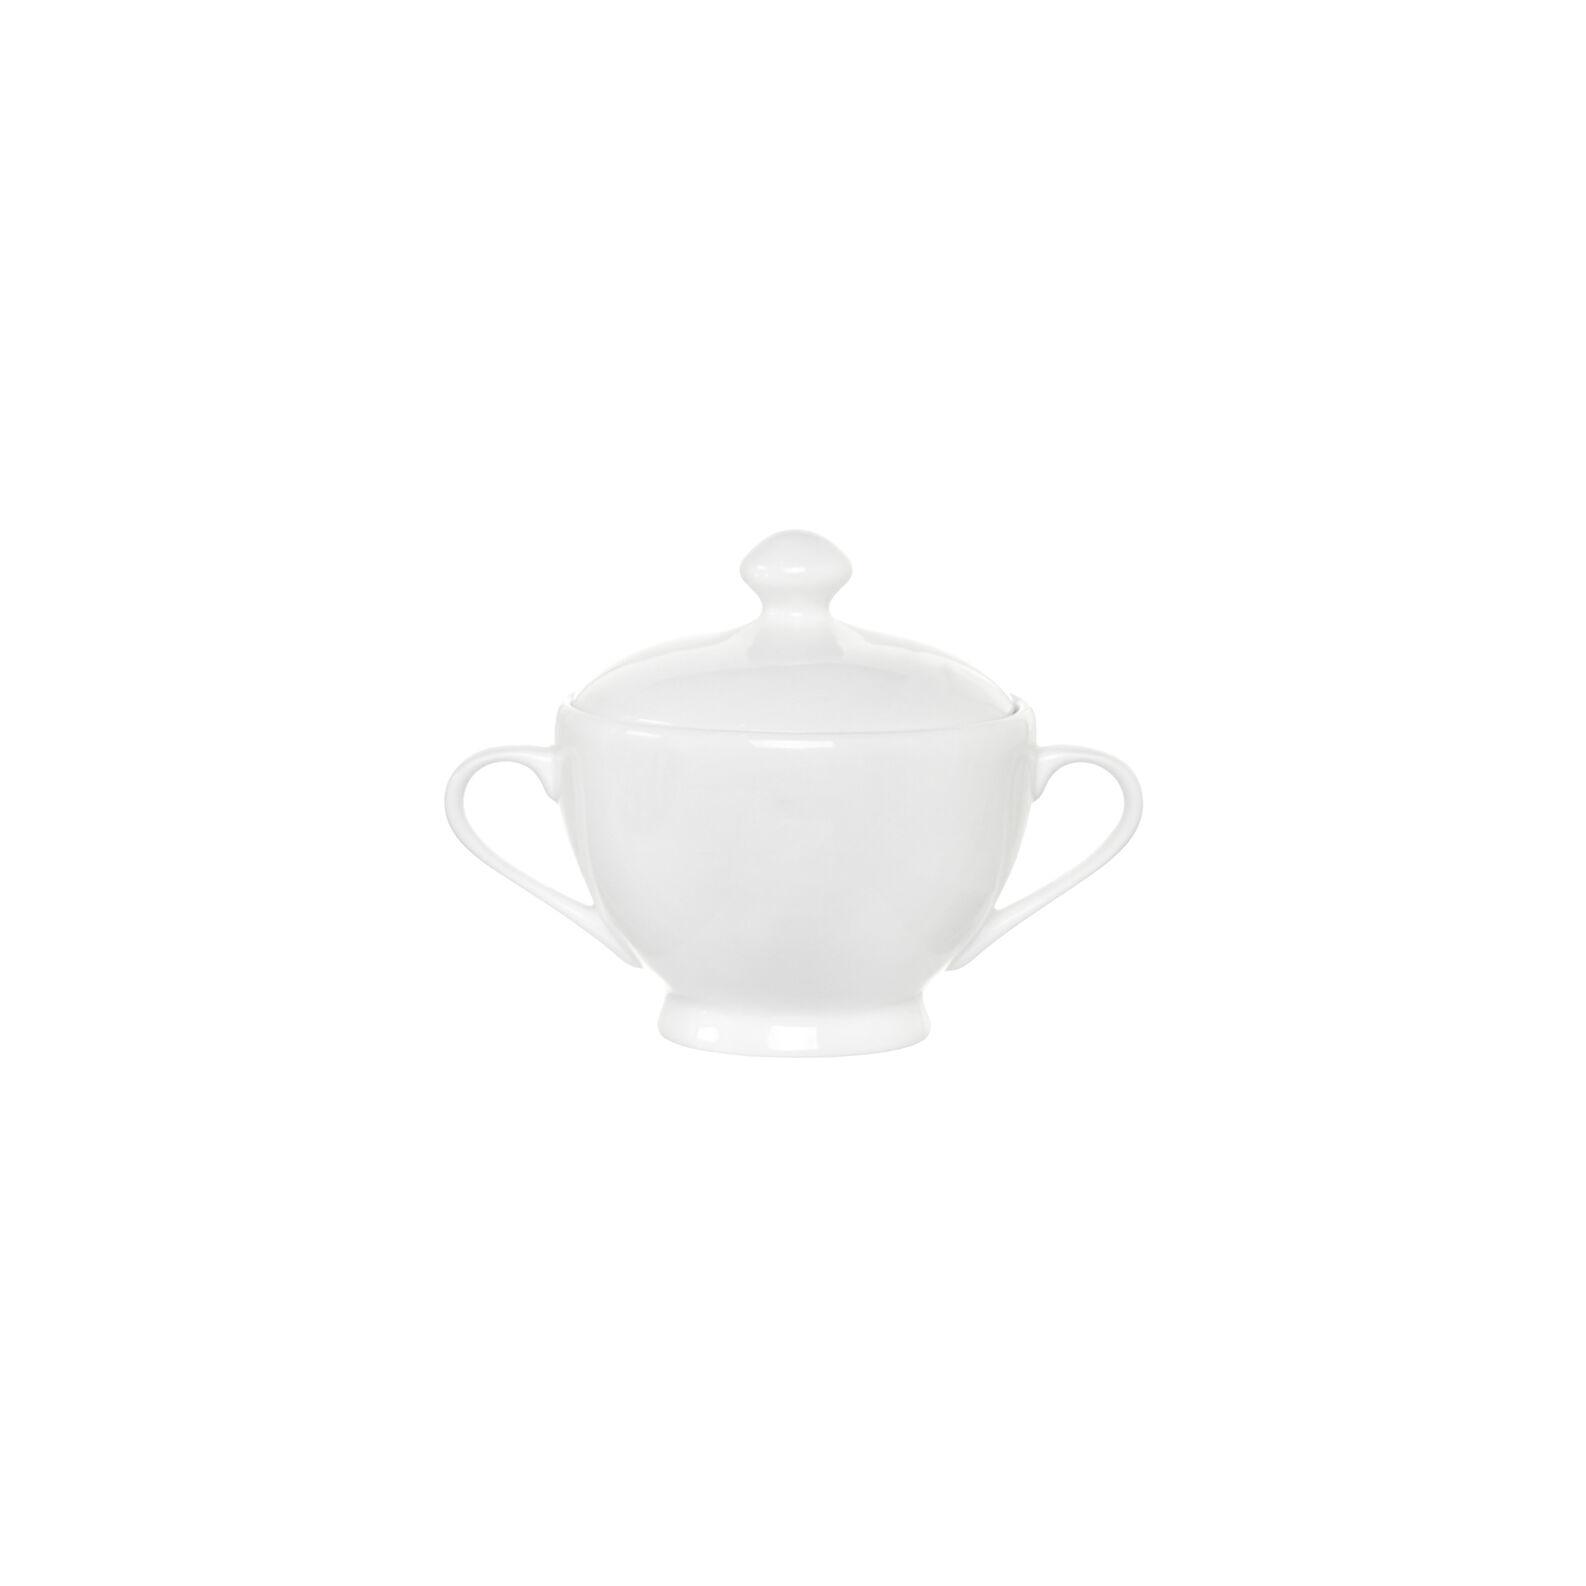 Veronica porcelain sugar bowl